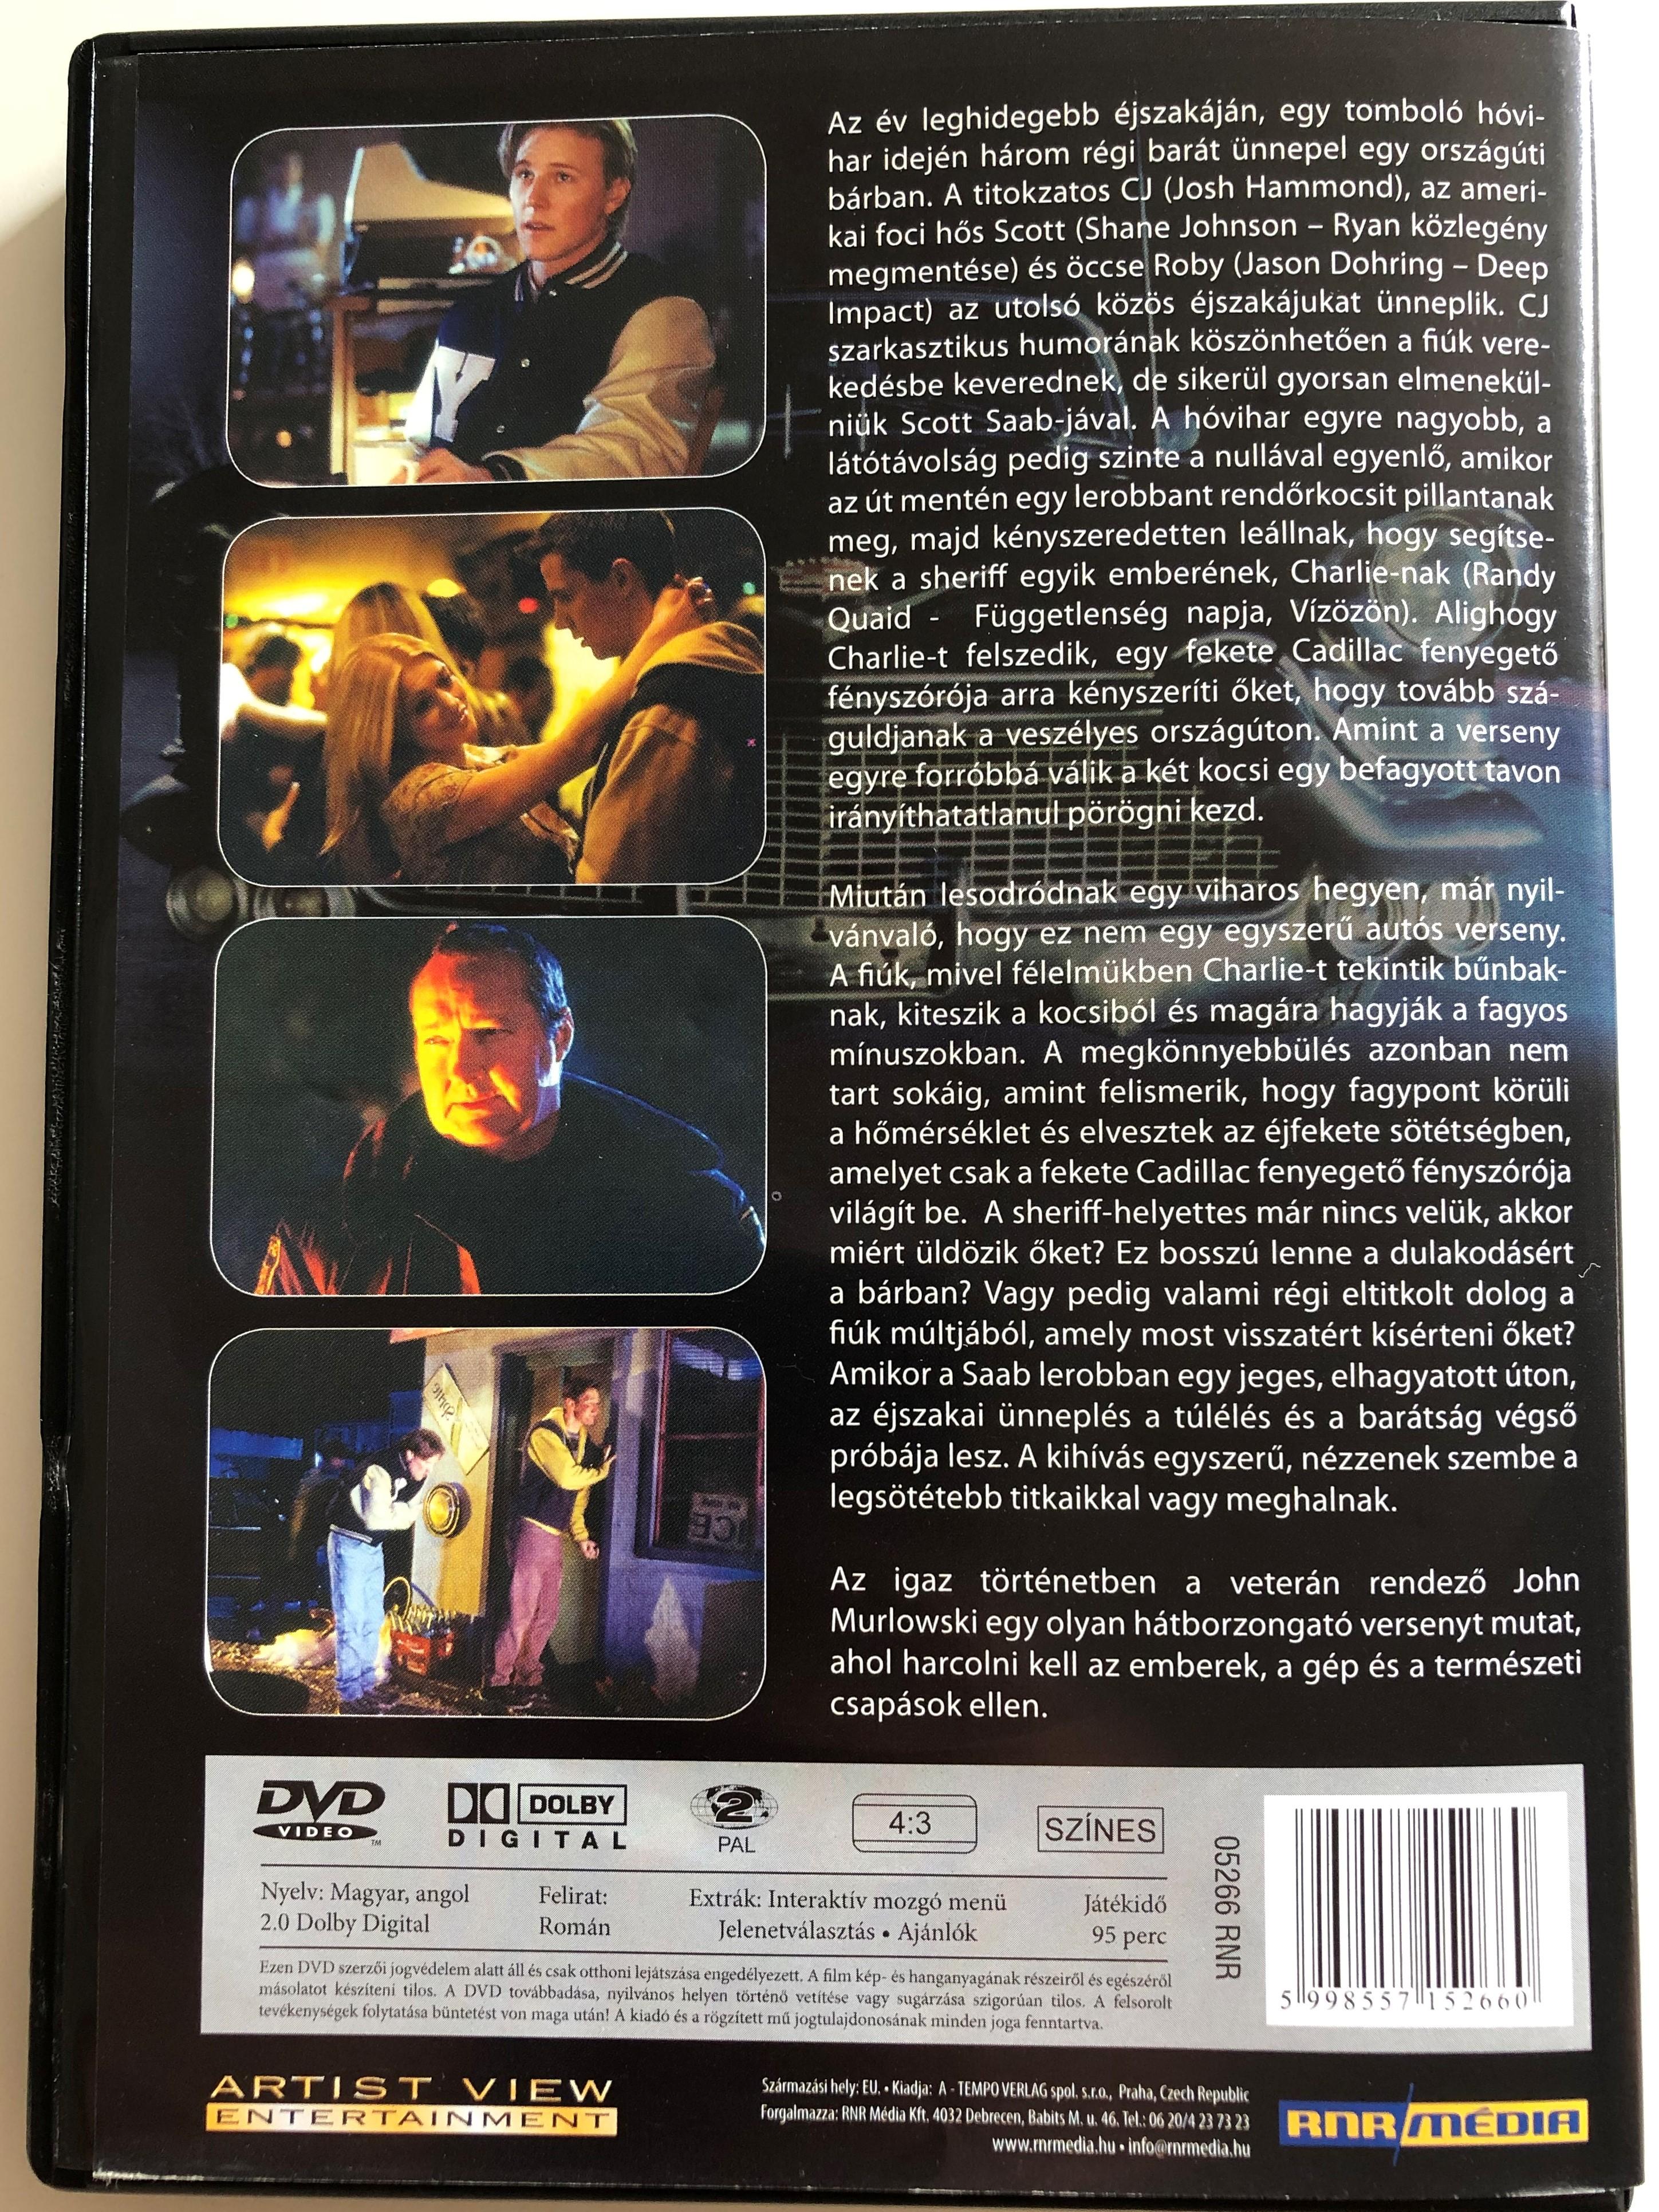 black-cadillac-dvd-2003-fekete-cadillac-igaz-t-rt-net-alapj-n-directed-by-john-murlowski-starring-randy-quaid-shane-johnson-josh-hammond-jason-dohring-2-.jpg